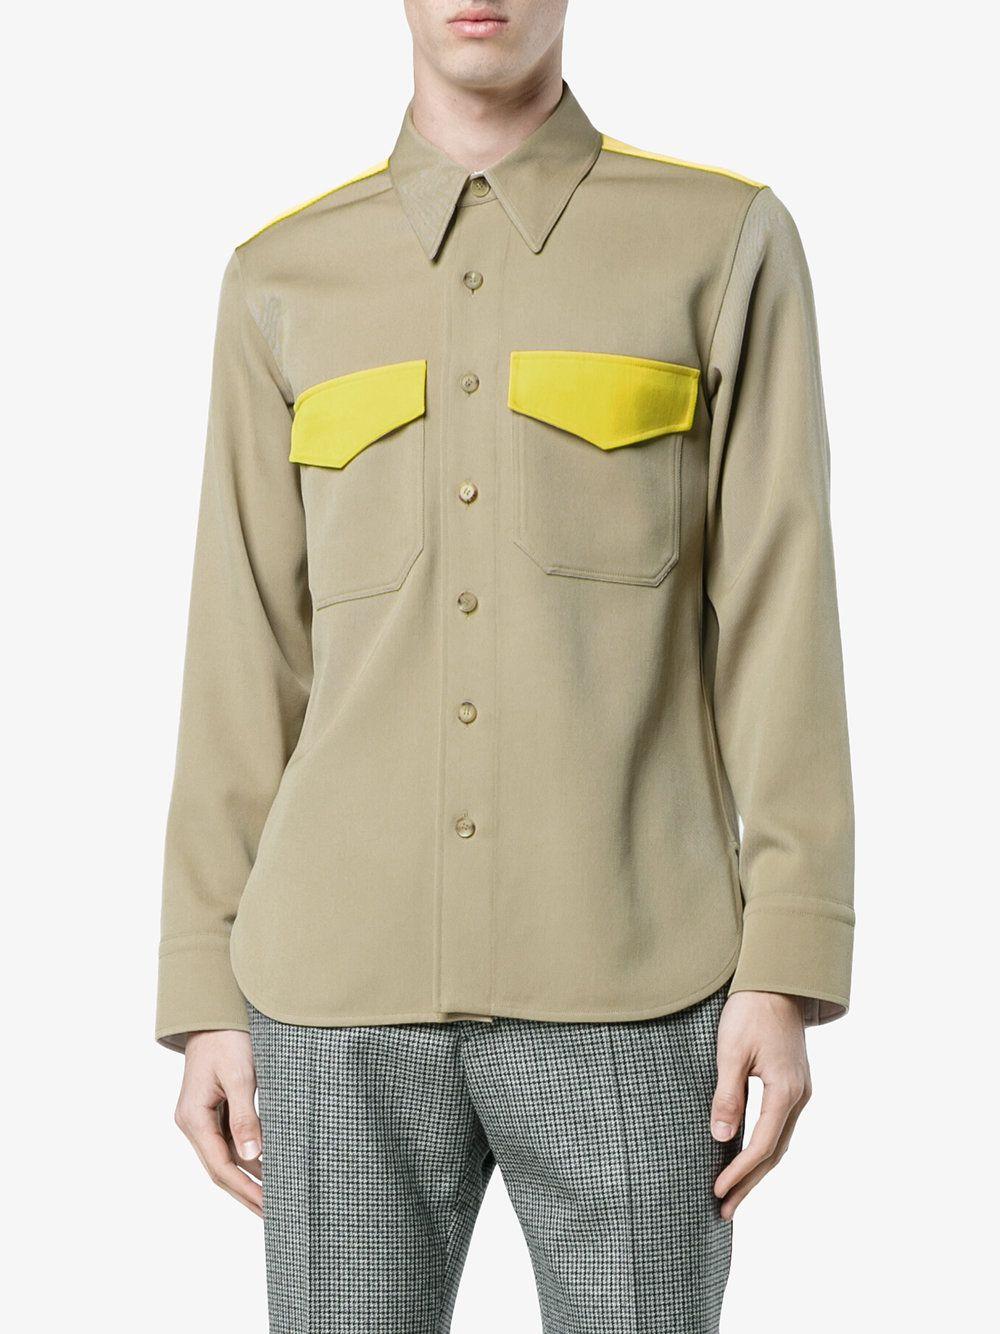 SHIRTS - Shirts CALVIN KLEIN 205W39NYC Free Shipping Release Dates XuiOrIVv